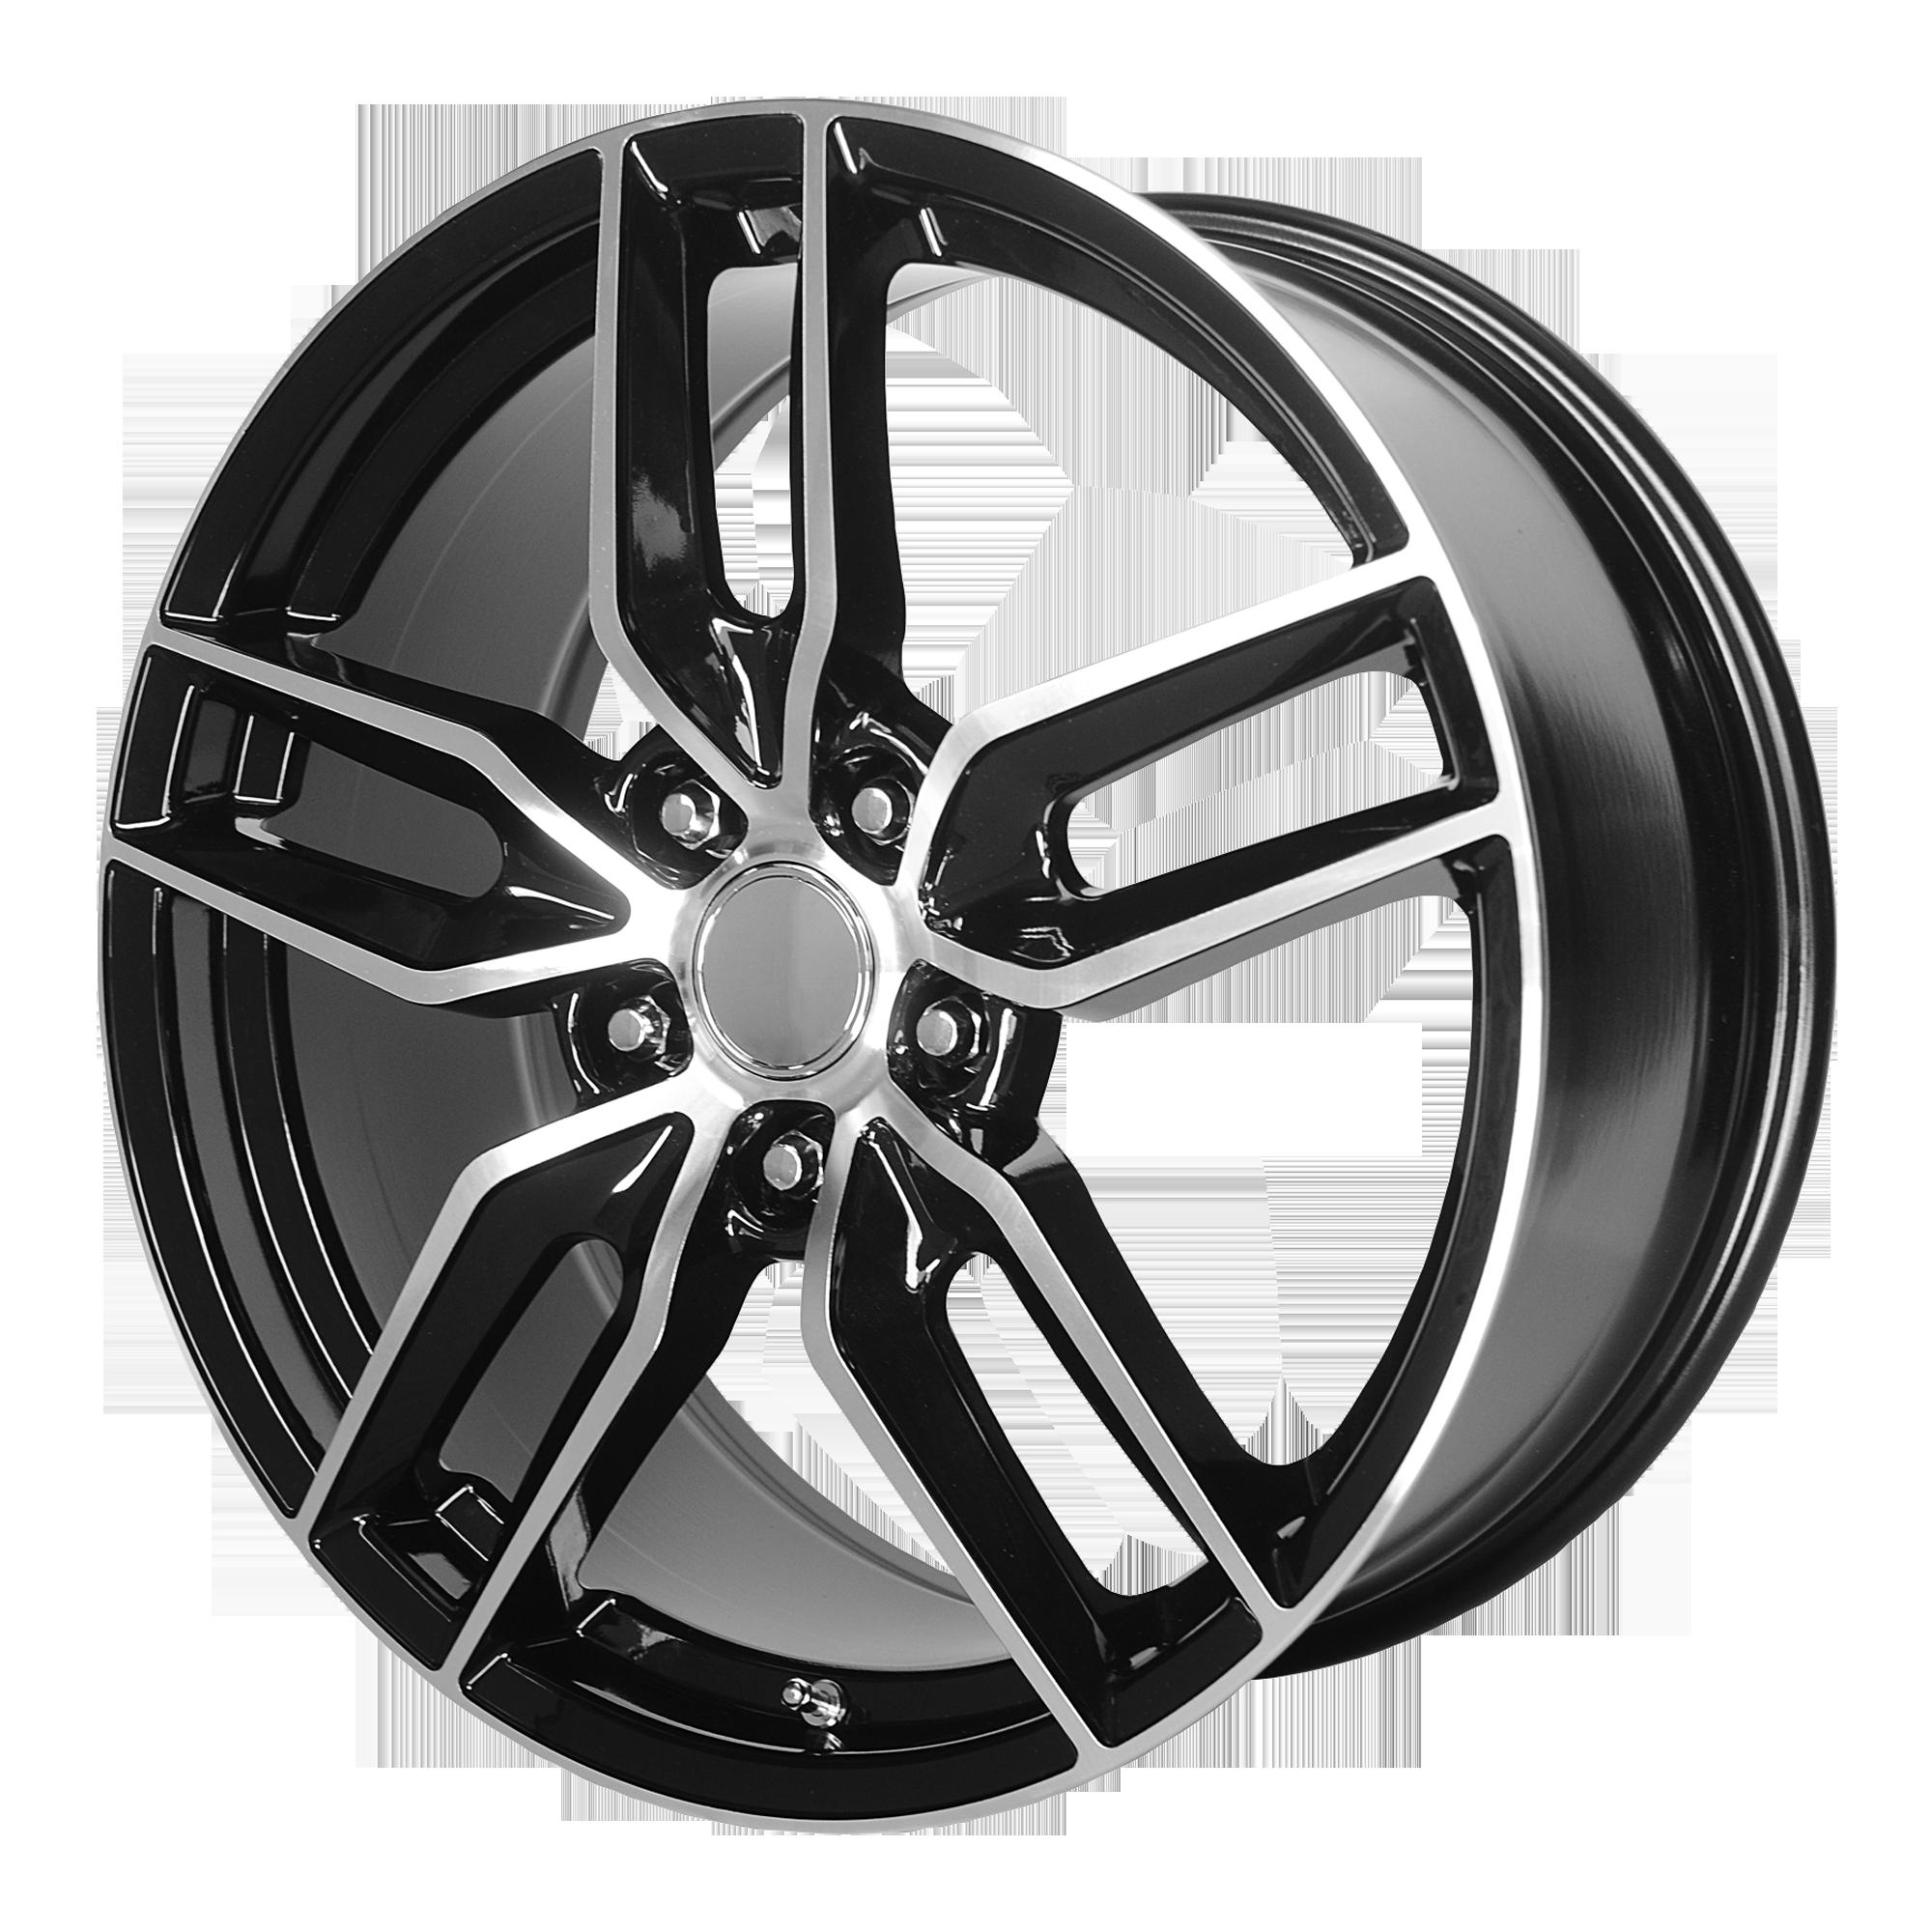 OE Creations Replica Wheels OE Creations PR160 Gloss Black w/ Machined Spokes